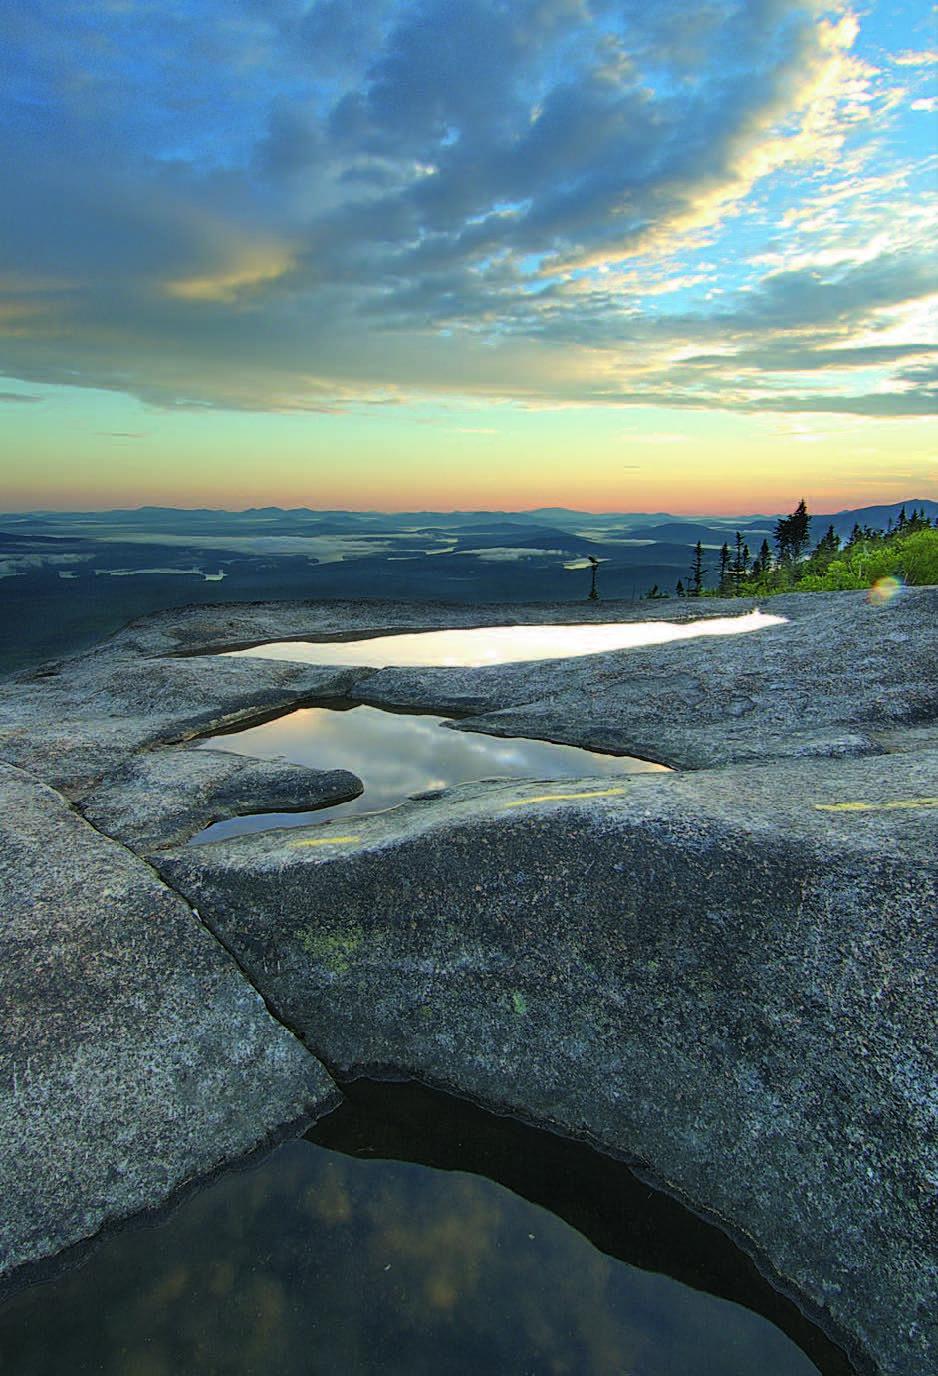 Adirondack Waters Spirit Of The Mountains Adirondack Explorer Adirondack Explorer